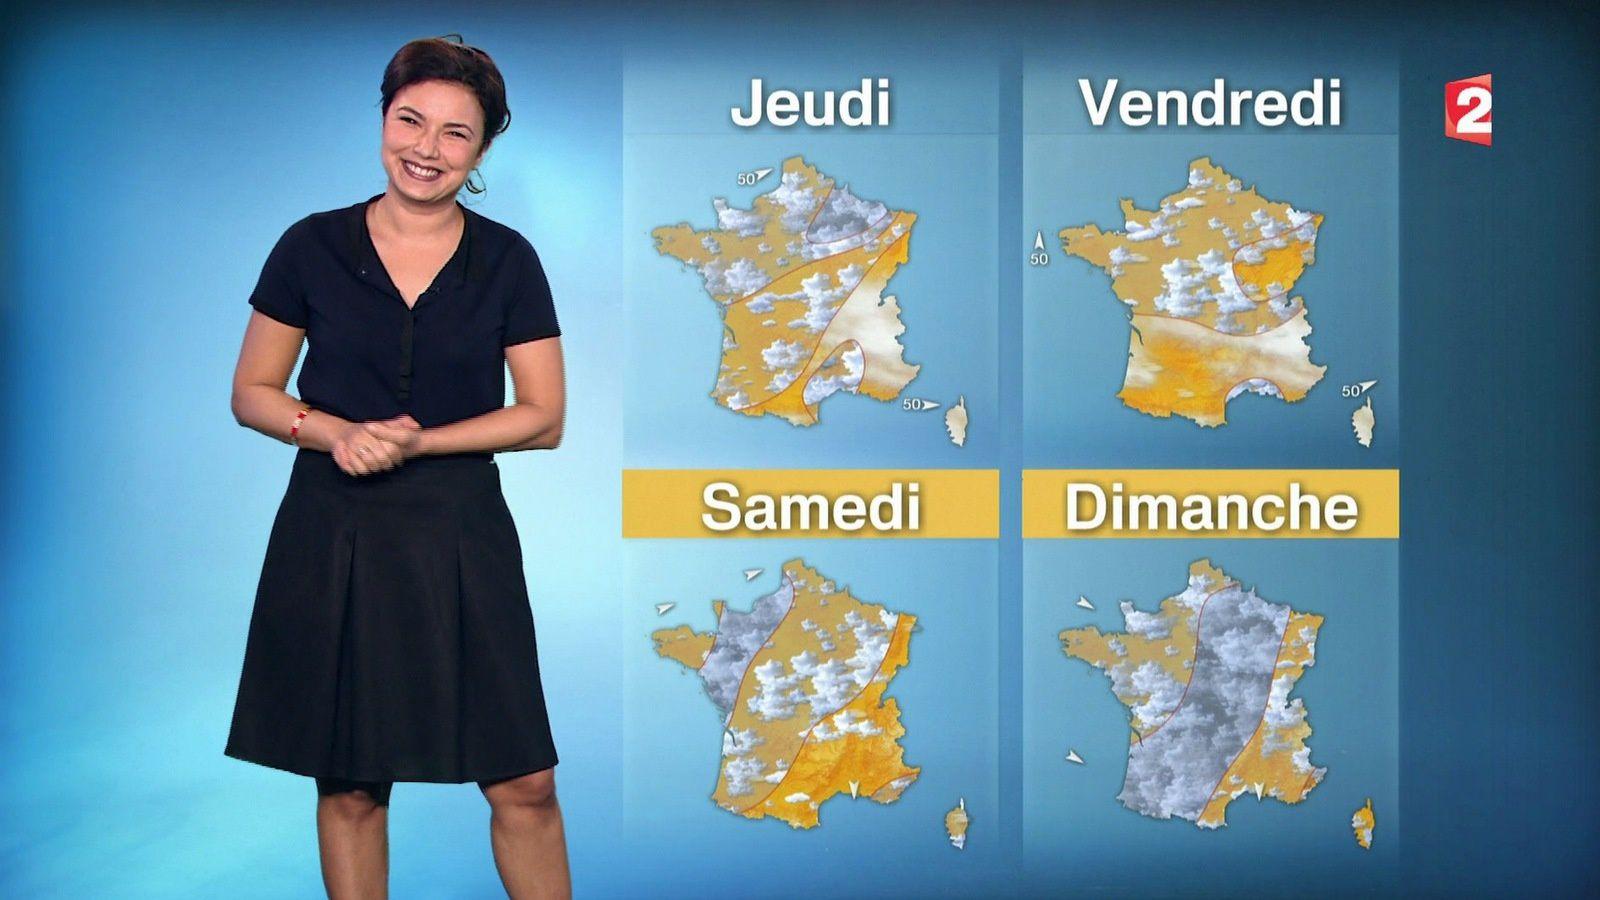 �2 �1 ANAIS BAYDEMIR pour LA METEO ce MIDI @France2tv #vuesalatele